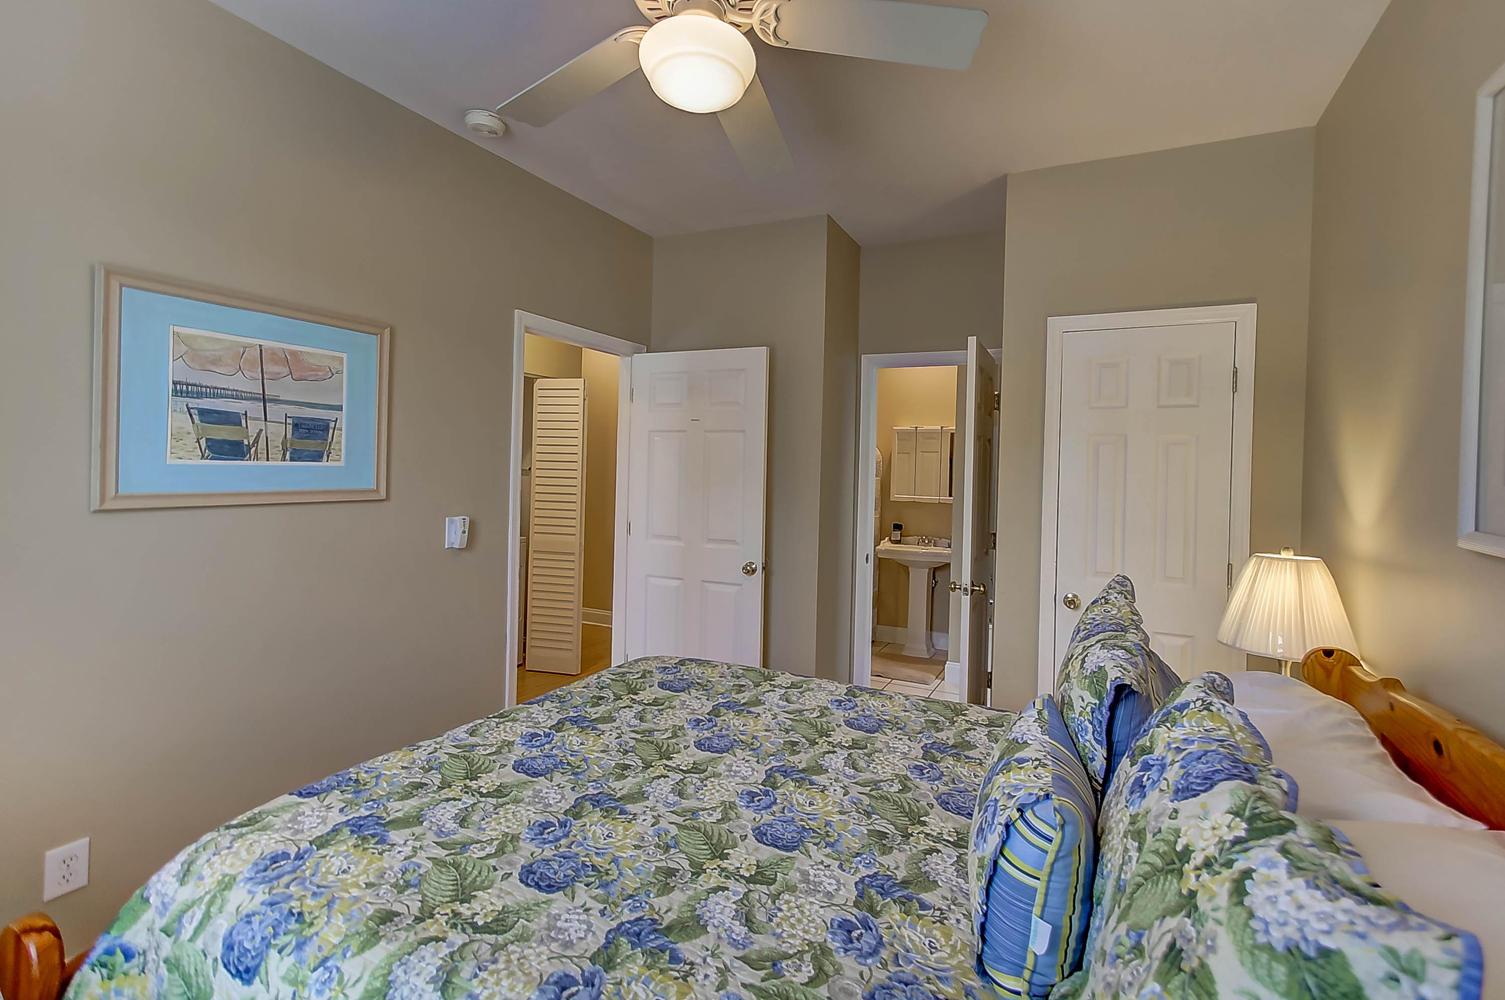 Beachwalker Villas Homes For Sale - 108 Ashley, Folly Beach, SC - 2